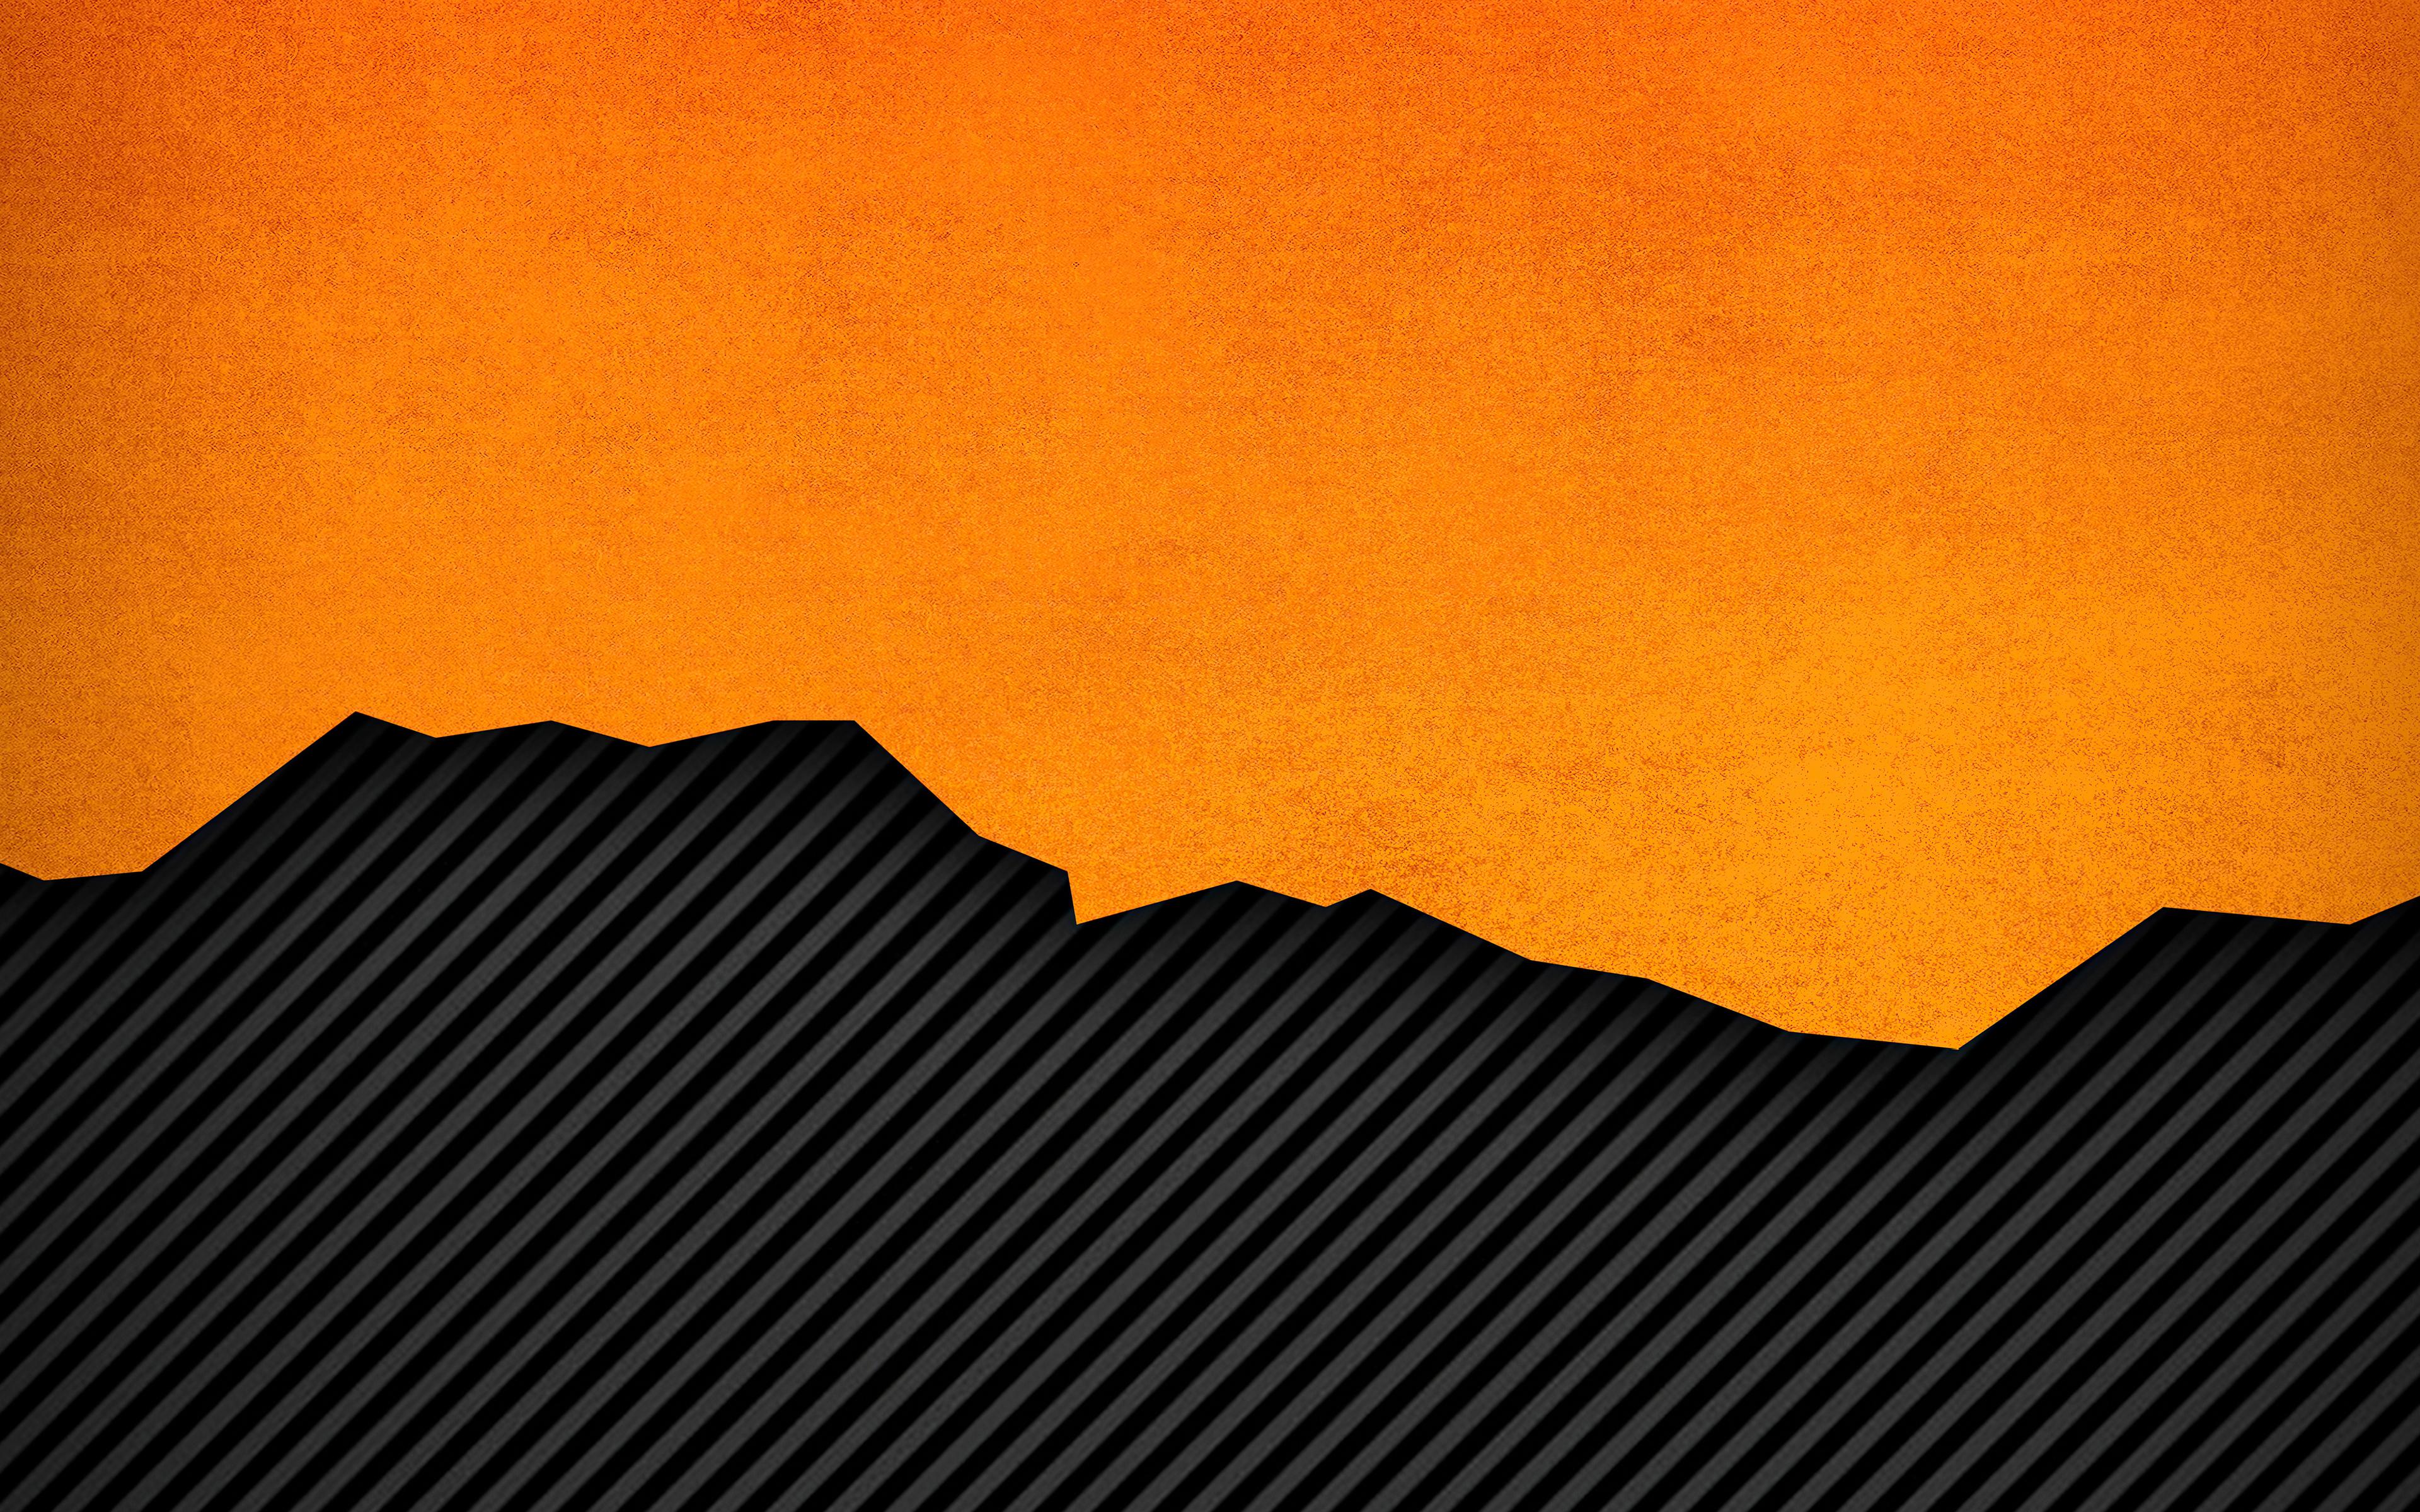 orange-lines-abstract-pattern-4k-hn.jpg